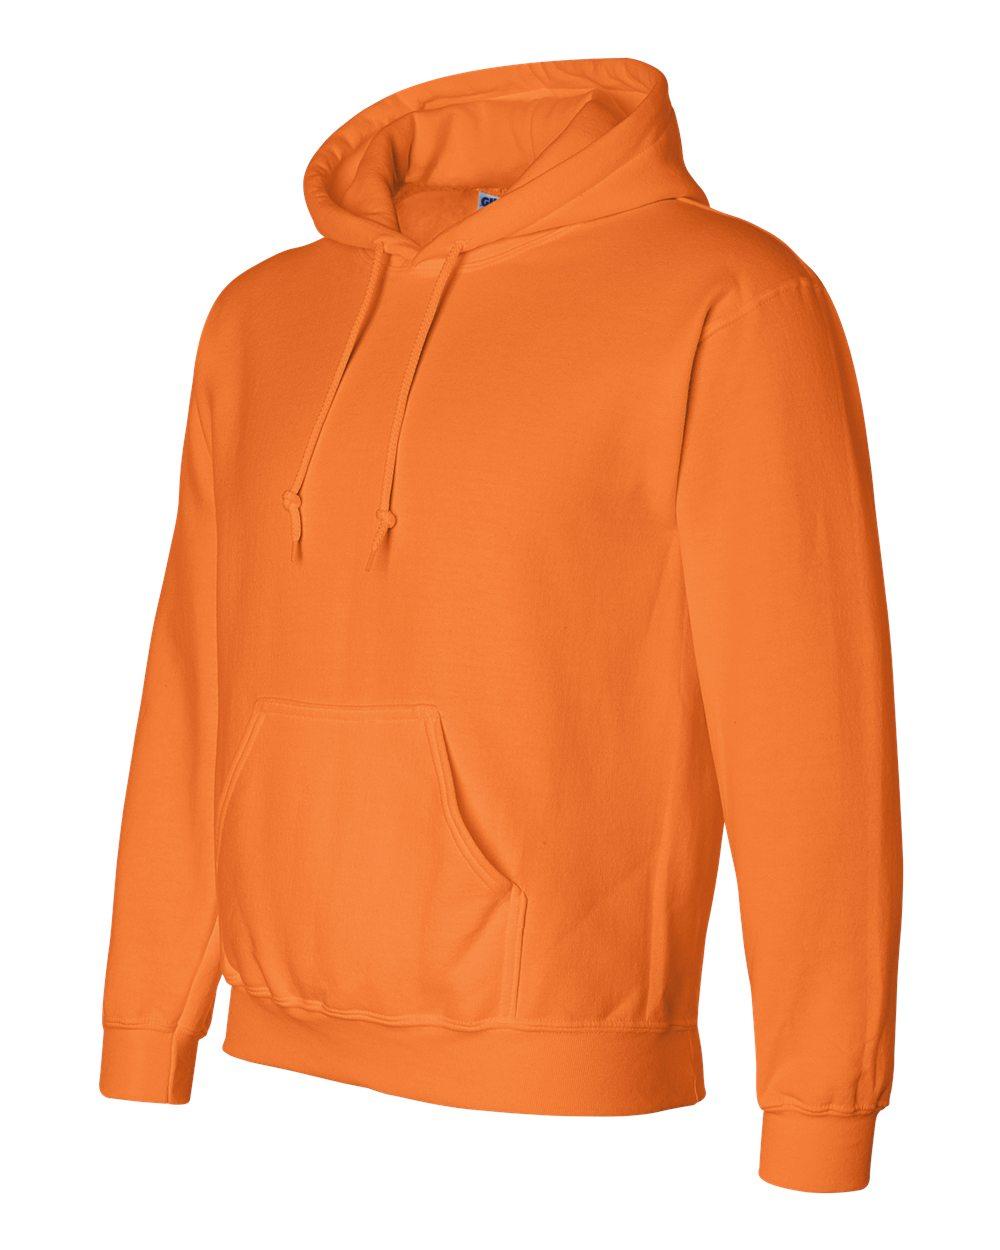 GIL12500 Safety Orange